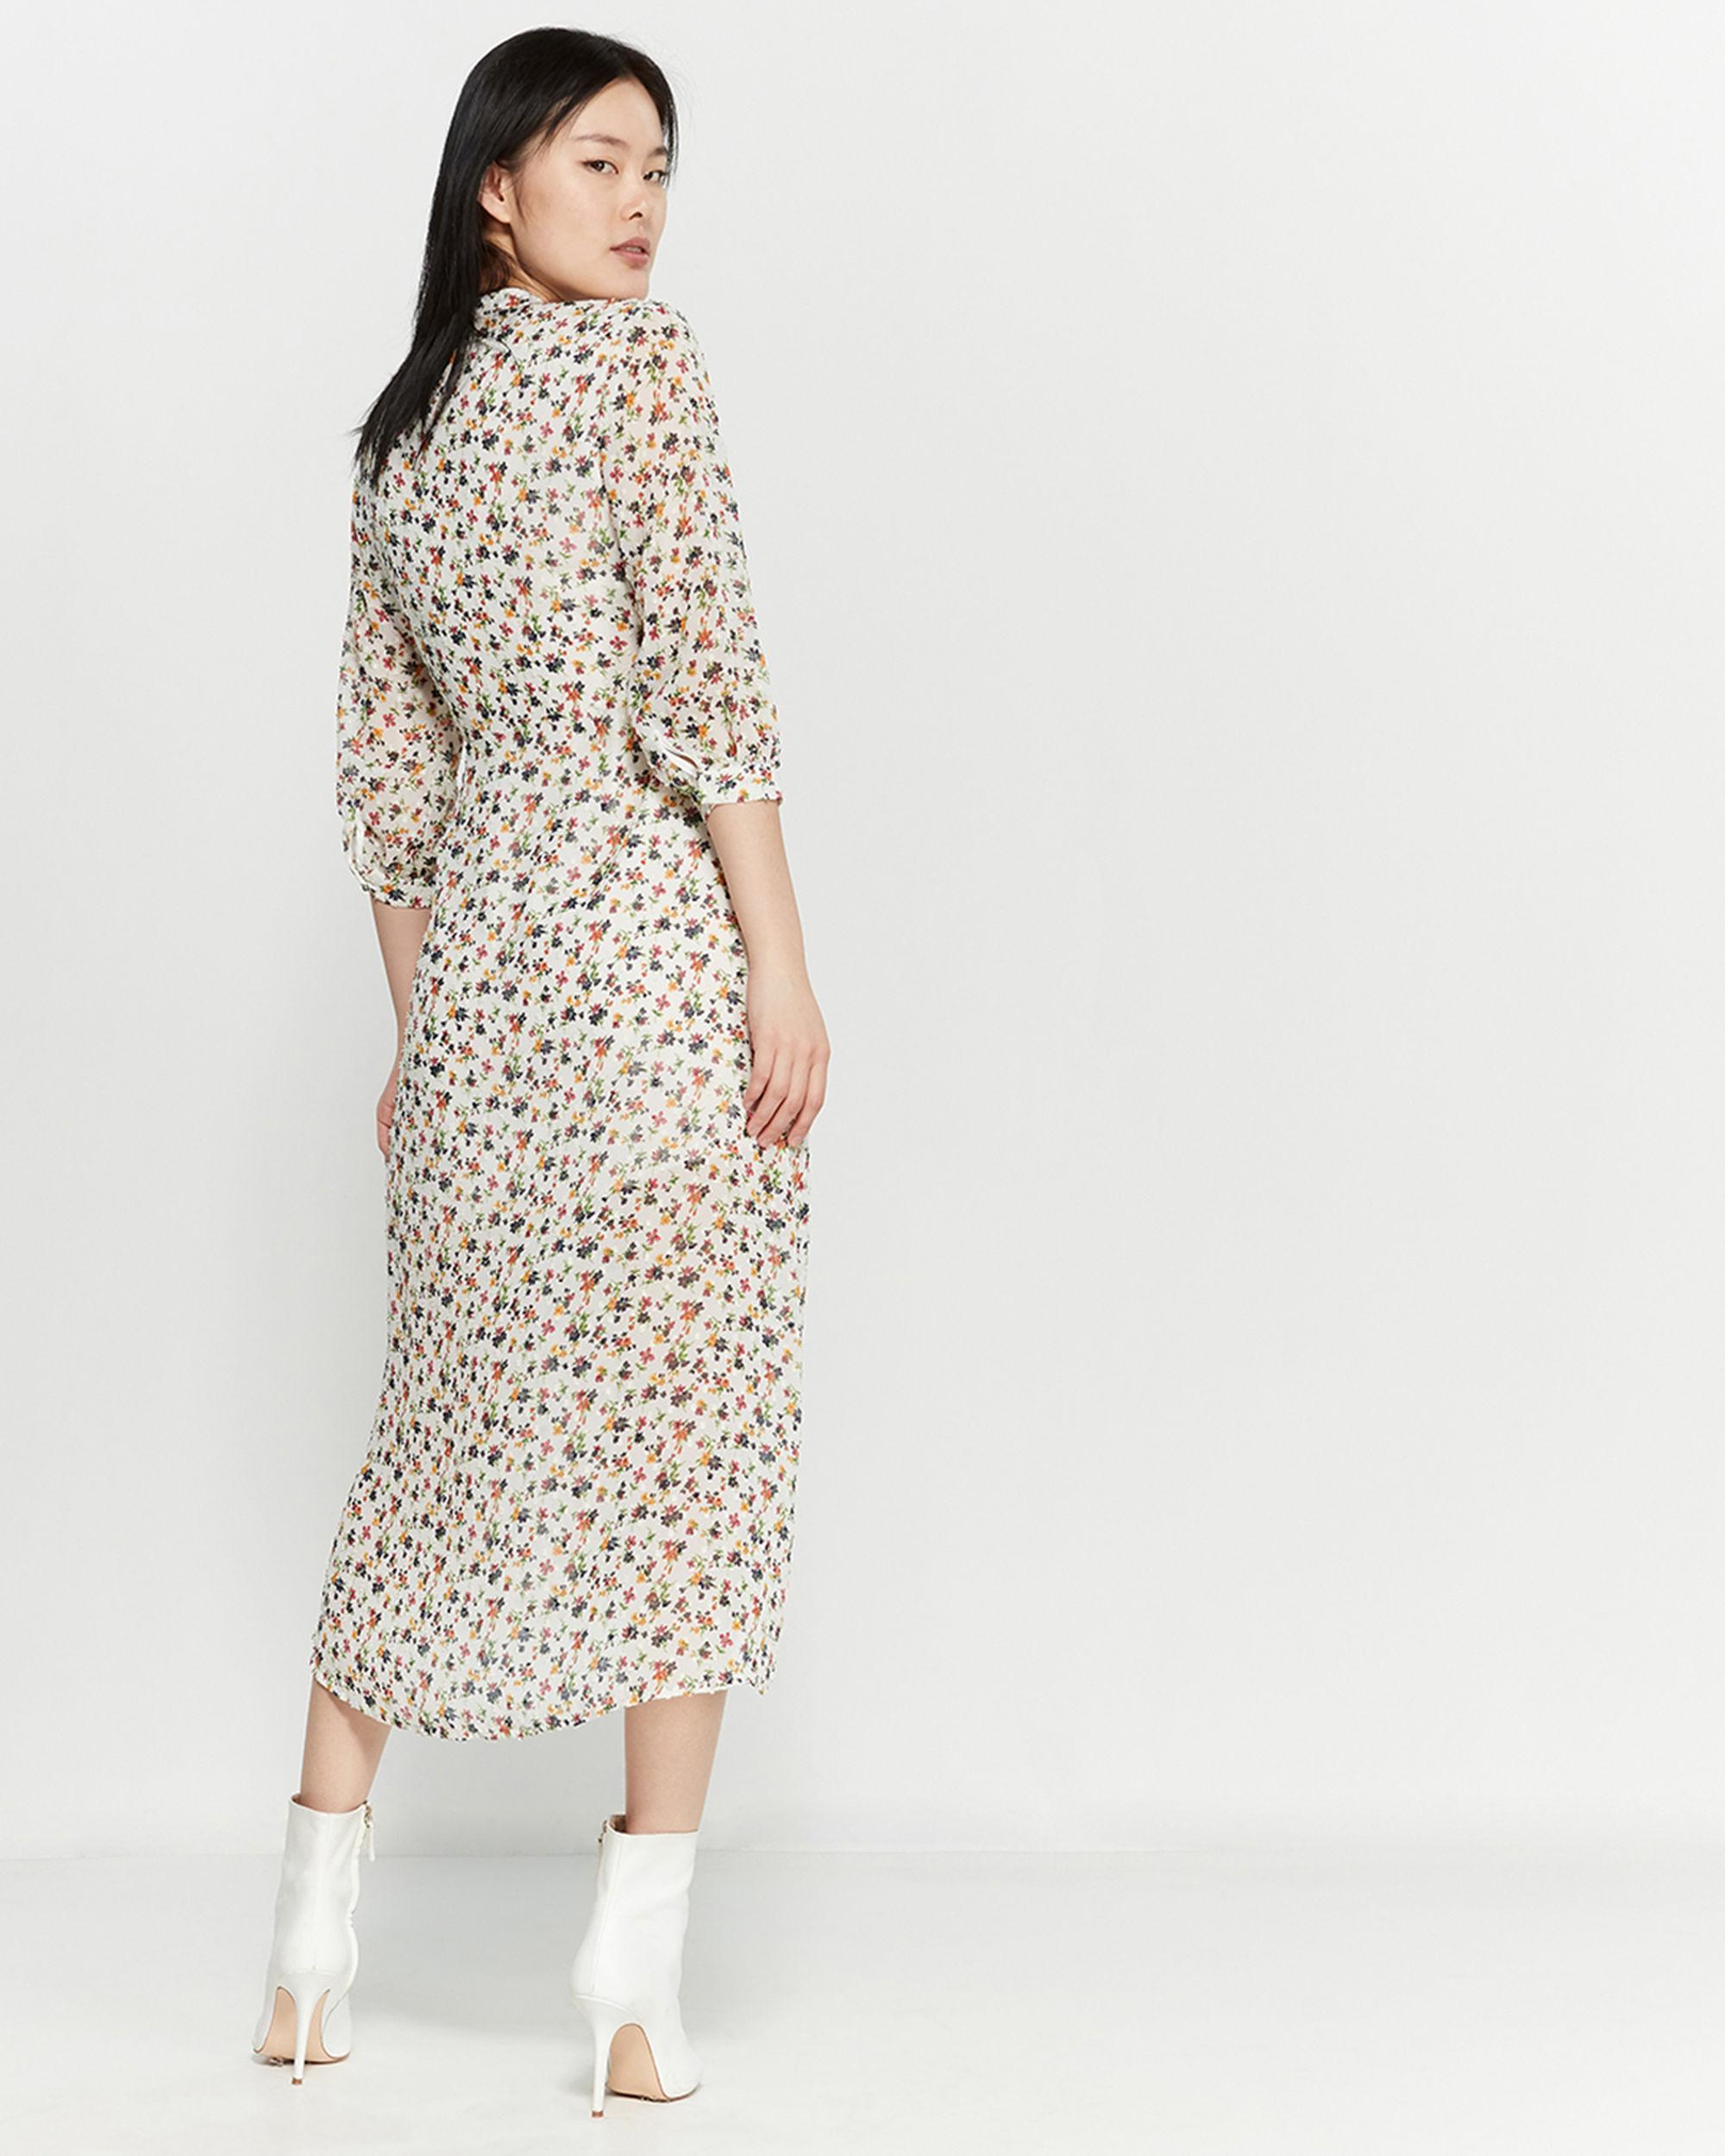 aae93e0704e2 Lyst - Lush Ivory Ditsy Floral Wrap Midi Dress in White